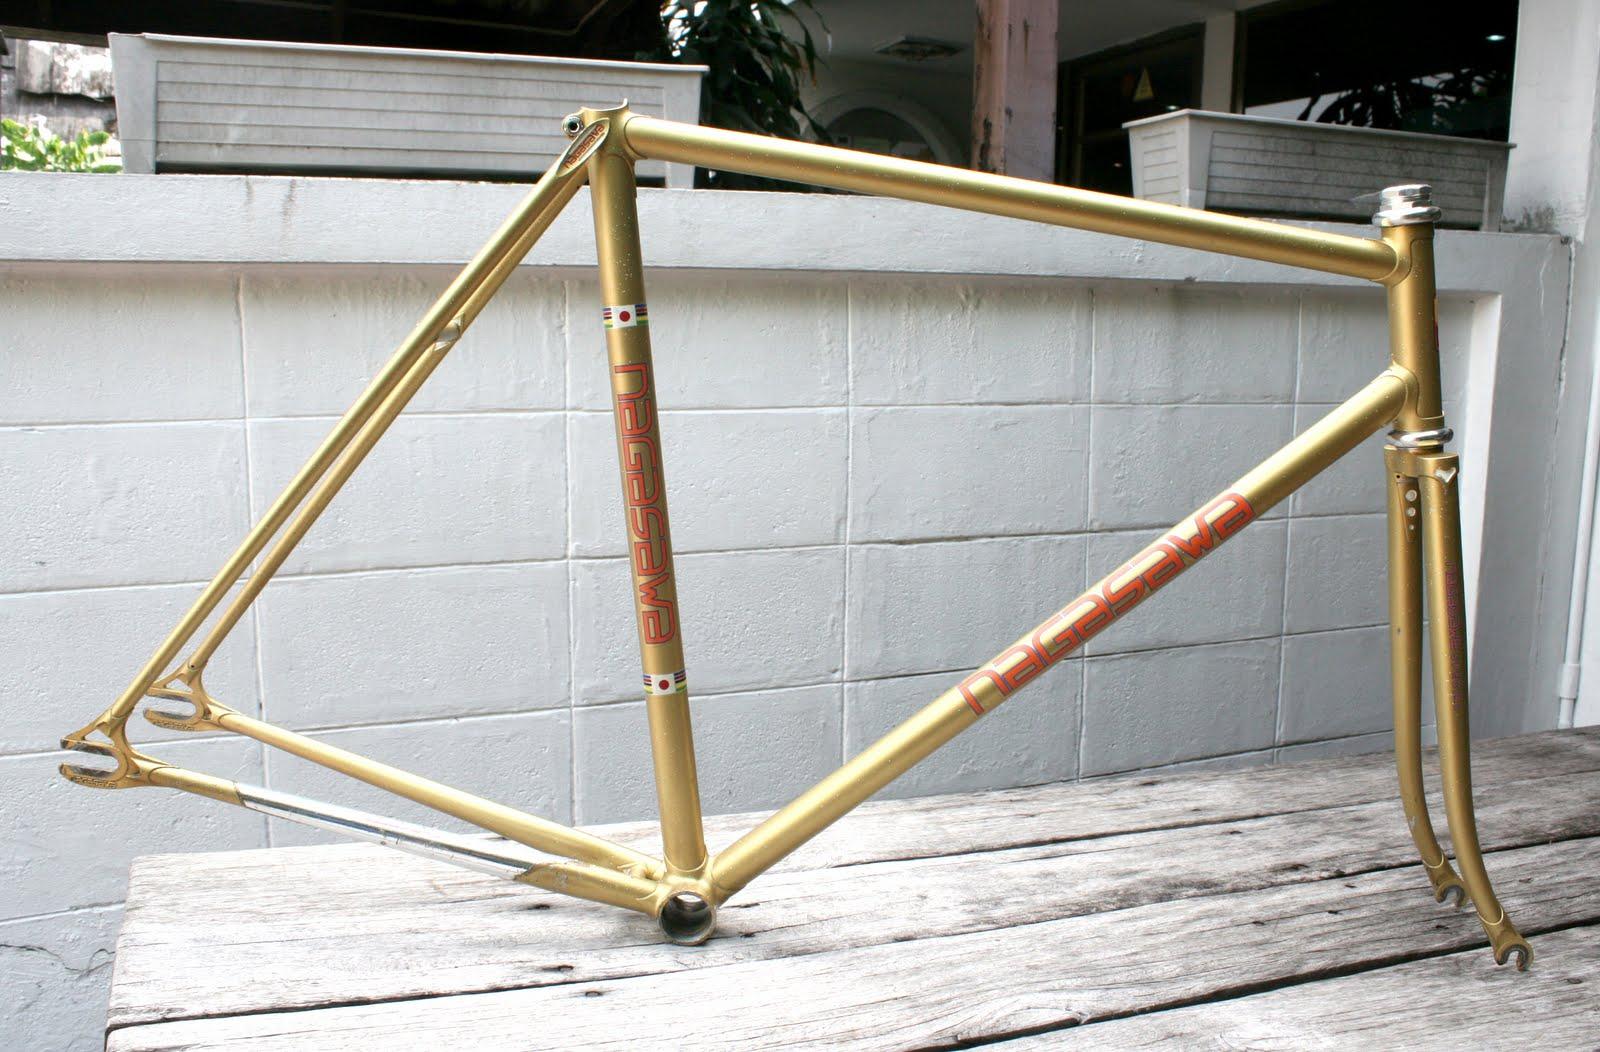 DUCKFIXED: Gold Sparkle Nagasawa Frame Track NJS Keirin @ DUCKFIXED